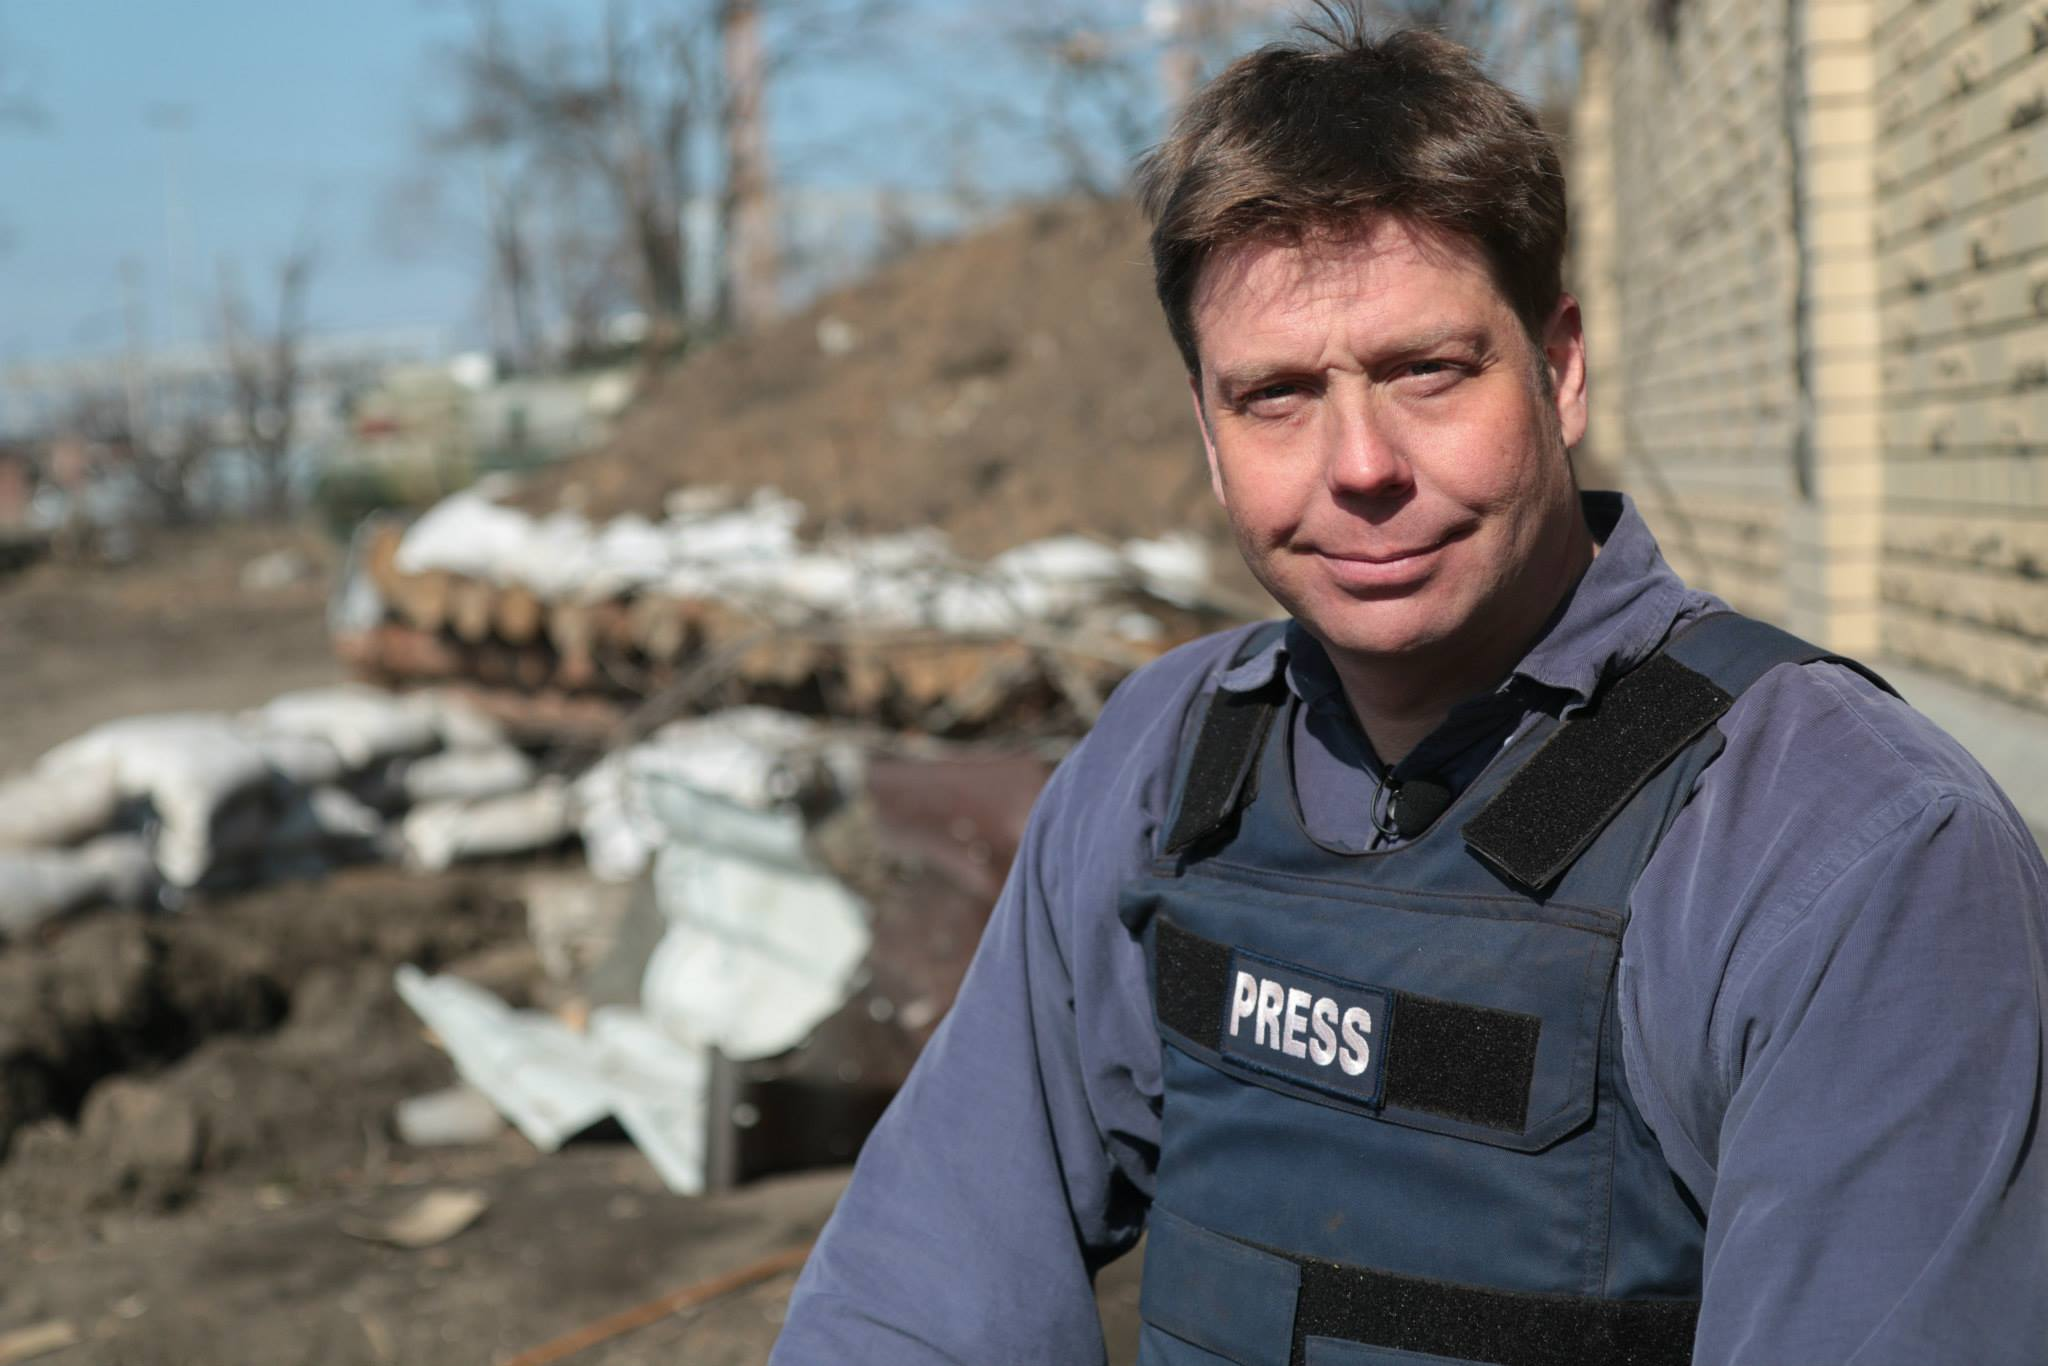 Ryan Chilcote Posing in Donetsk in Flak Jacket.jpg